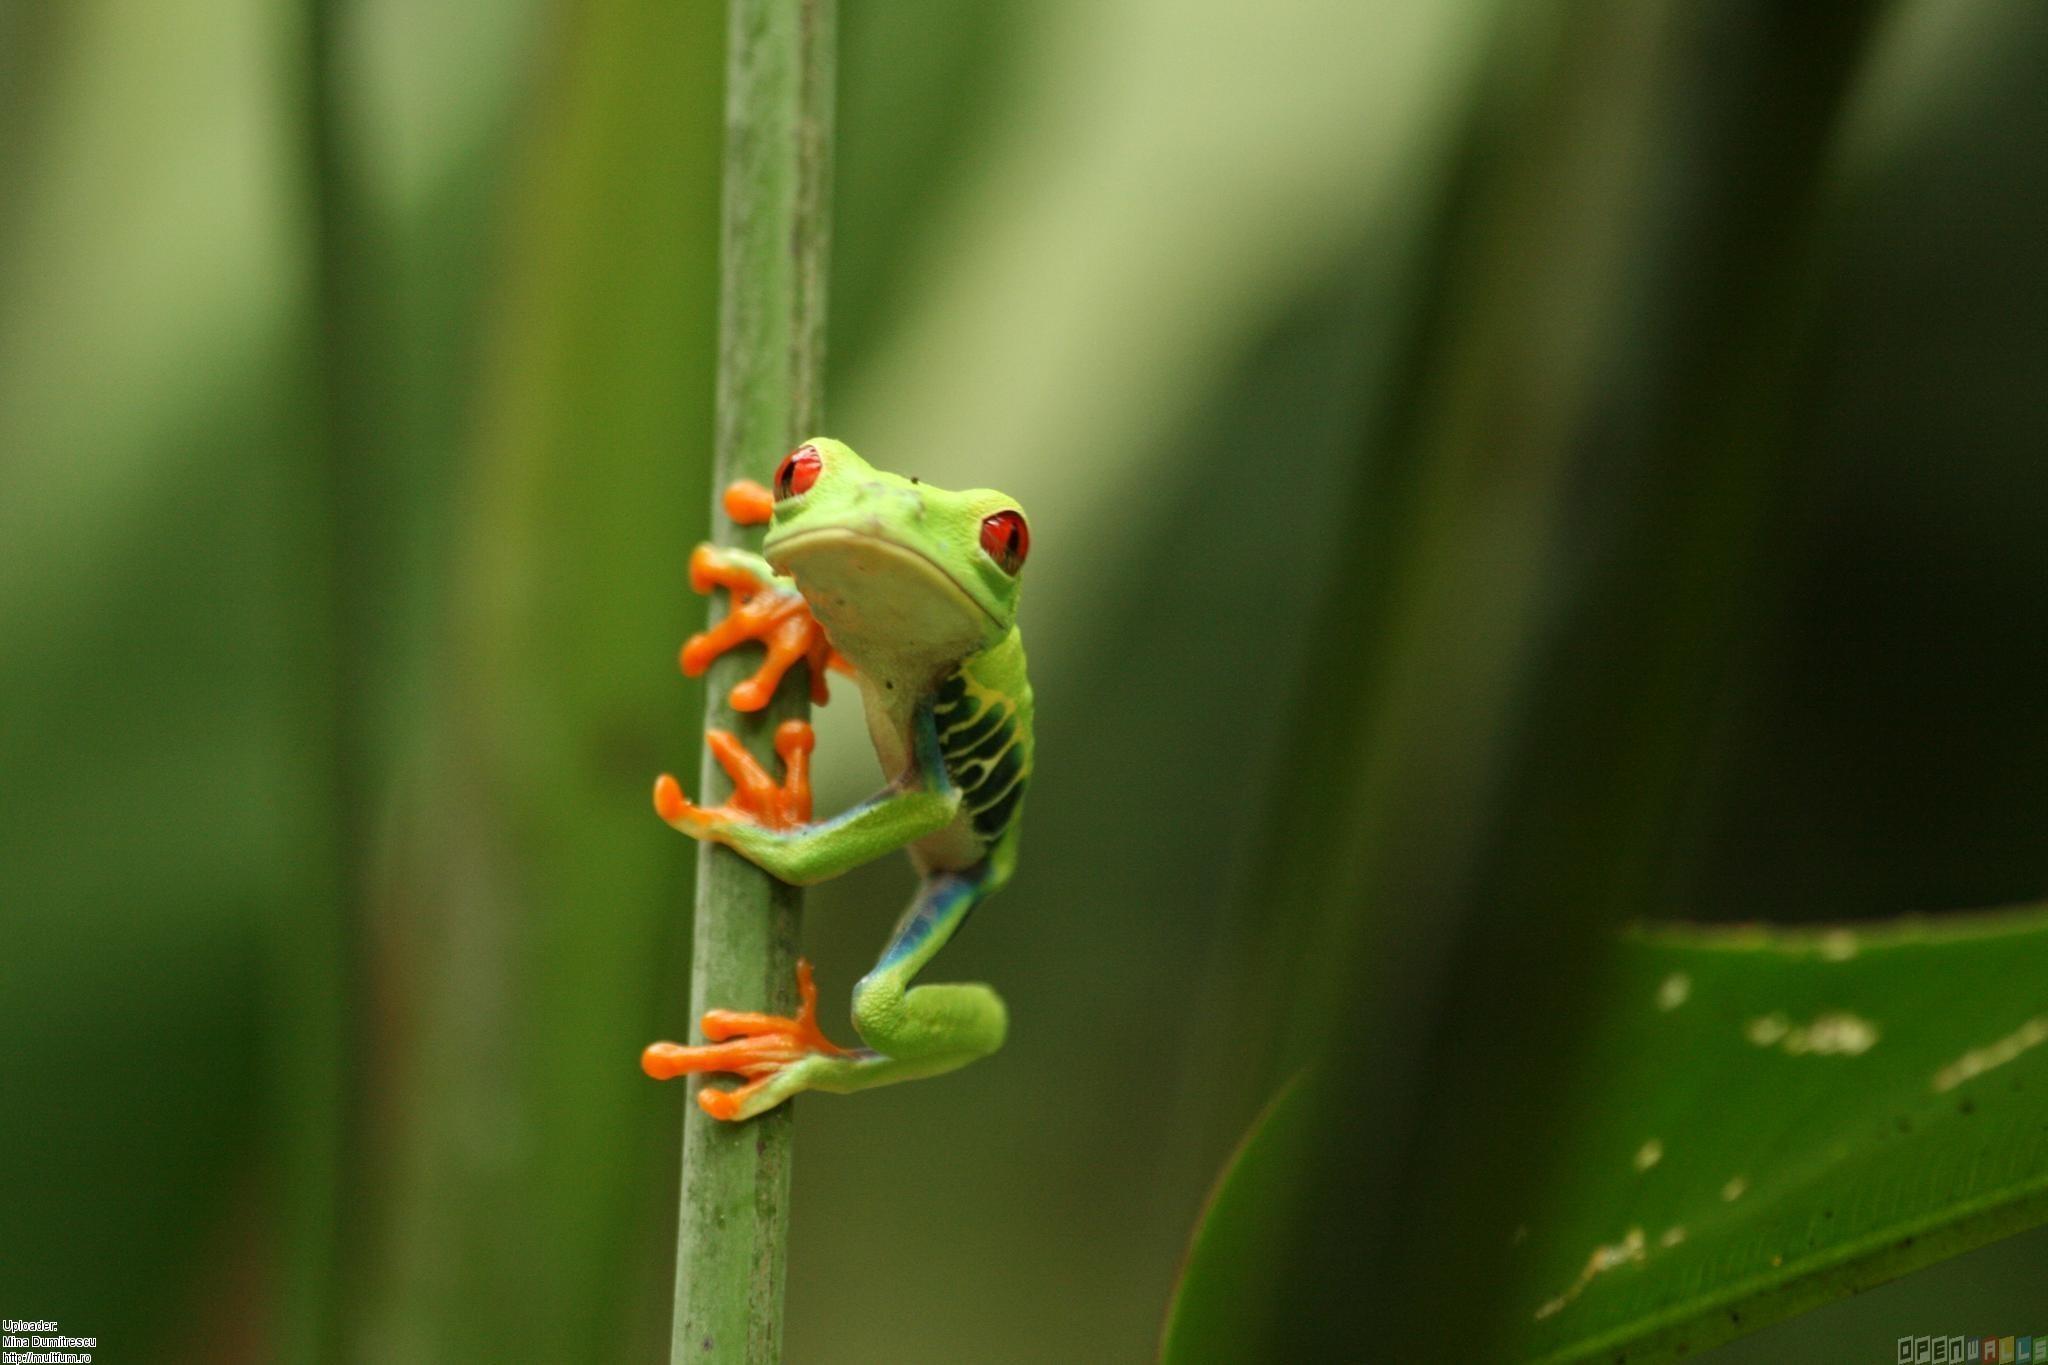 Cute frog wallpaper 23277   Open Walls 2048x1365